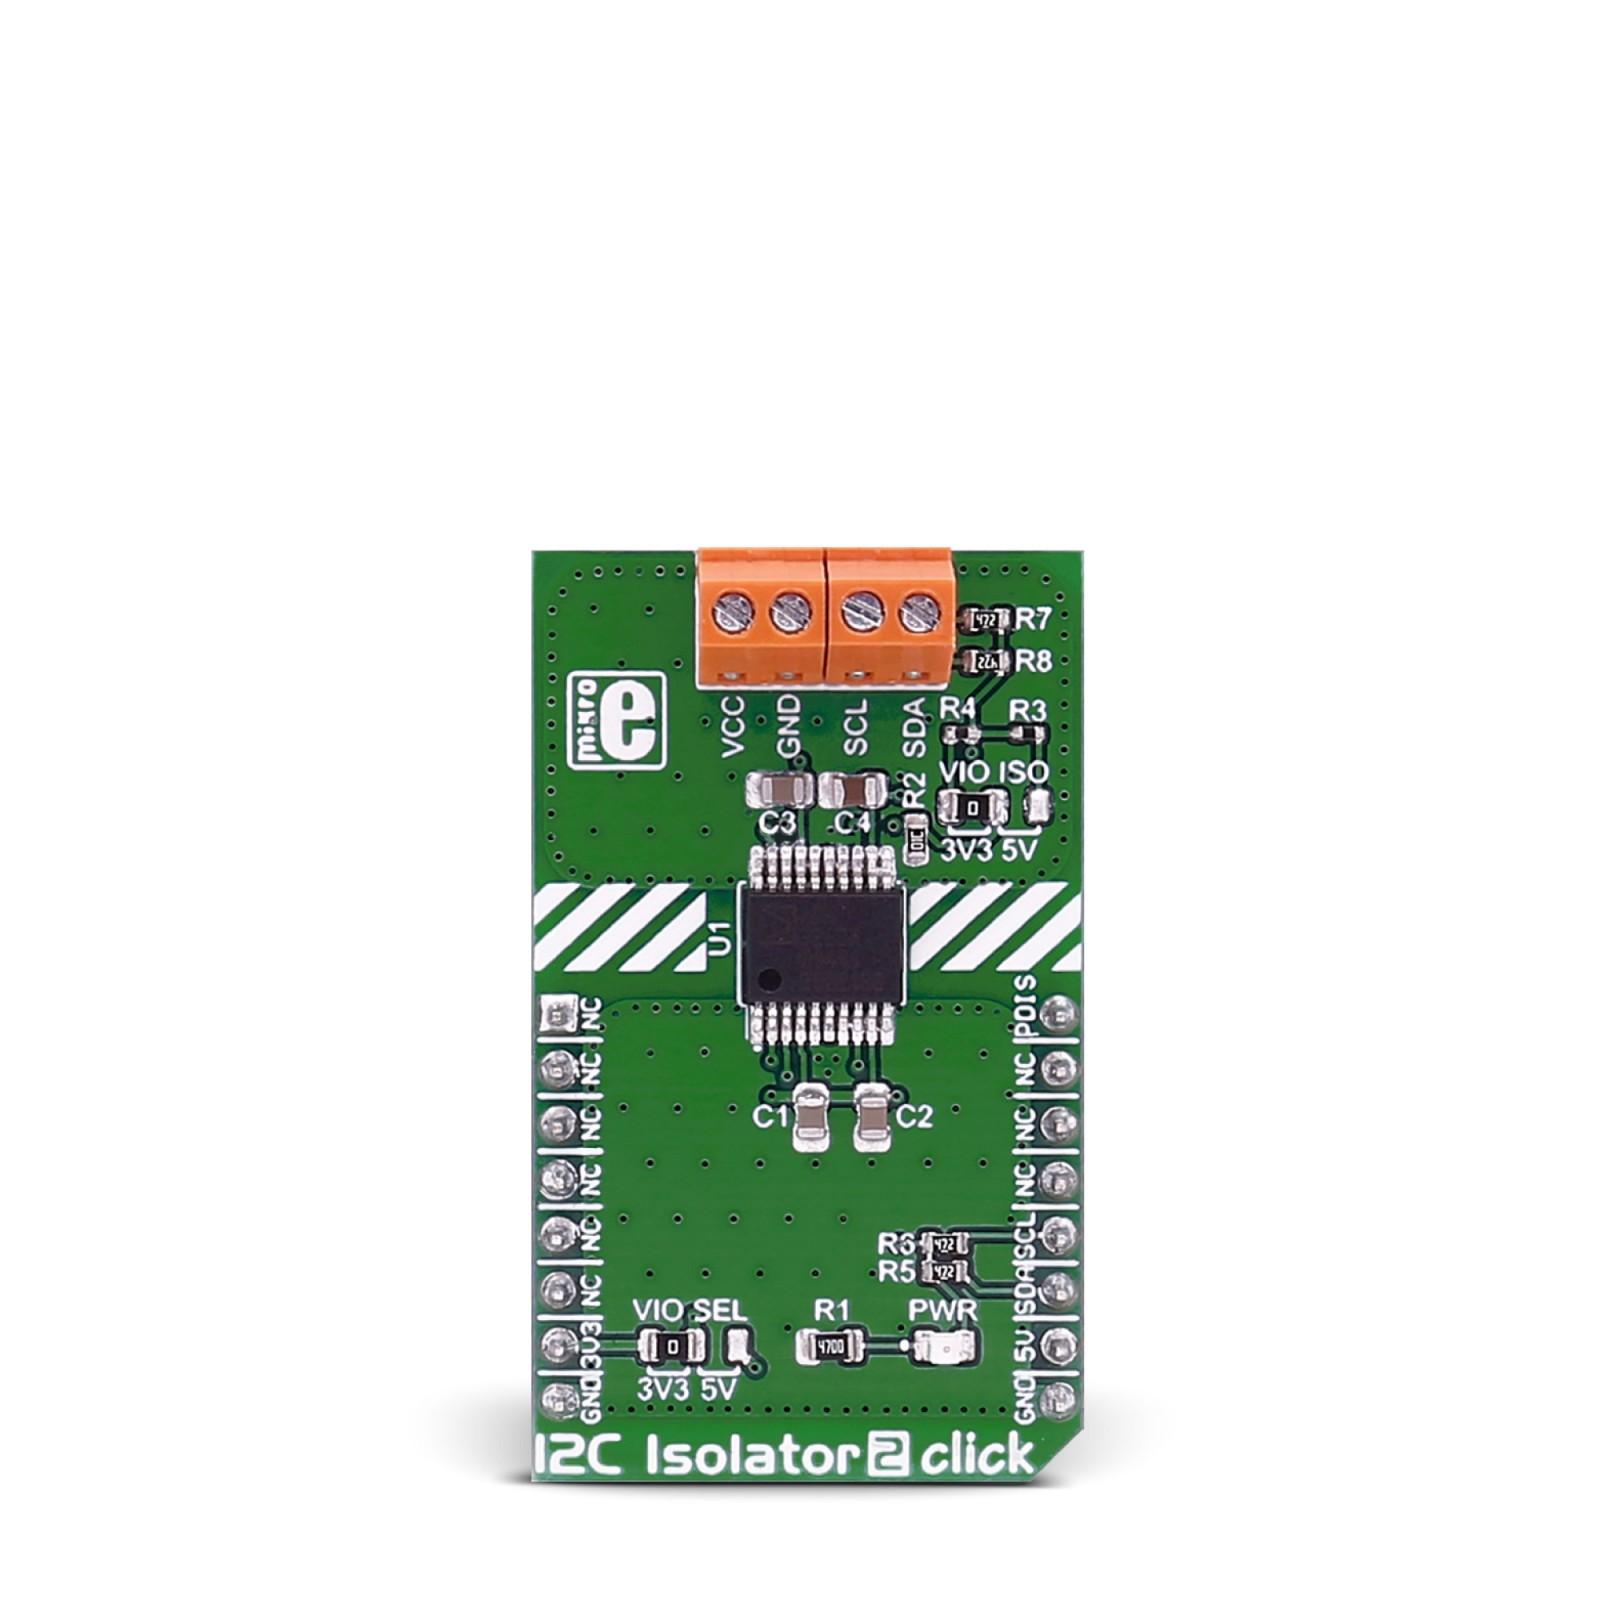 I2c Isolator 2 Click Board With Adm3260 Dual Wiring Diagram Mgctlbxnmzp Mgctlbxv5112 Mgctlbxlc Mgctlbxpprestashop